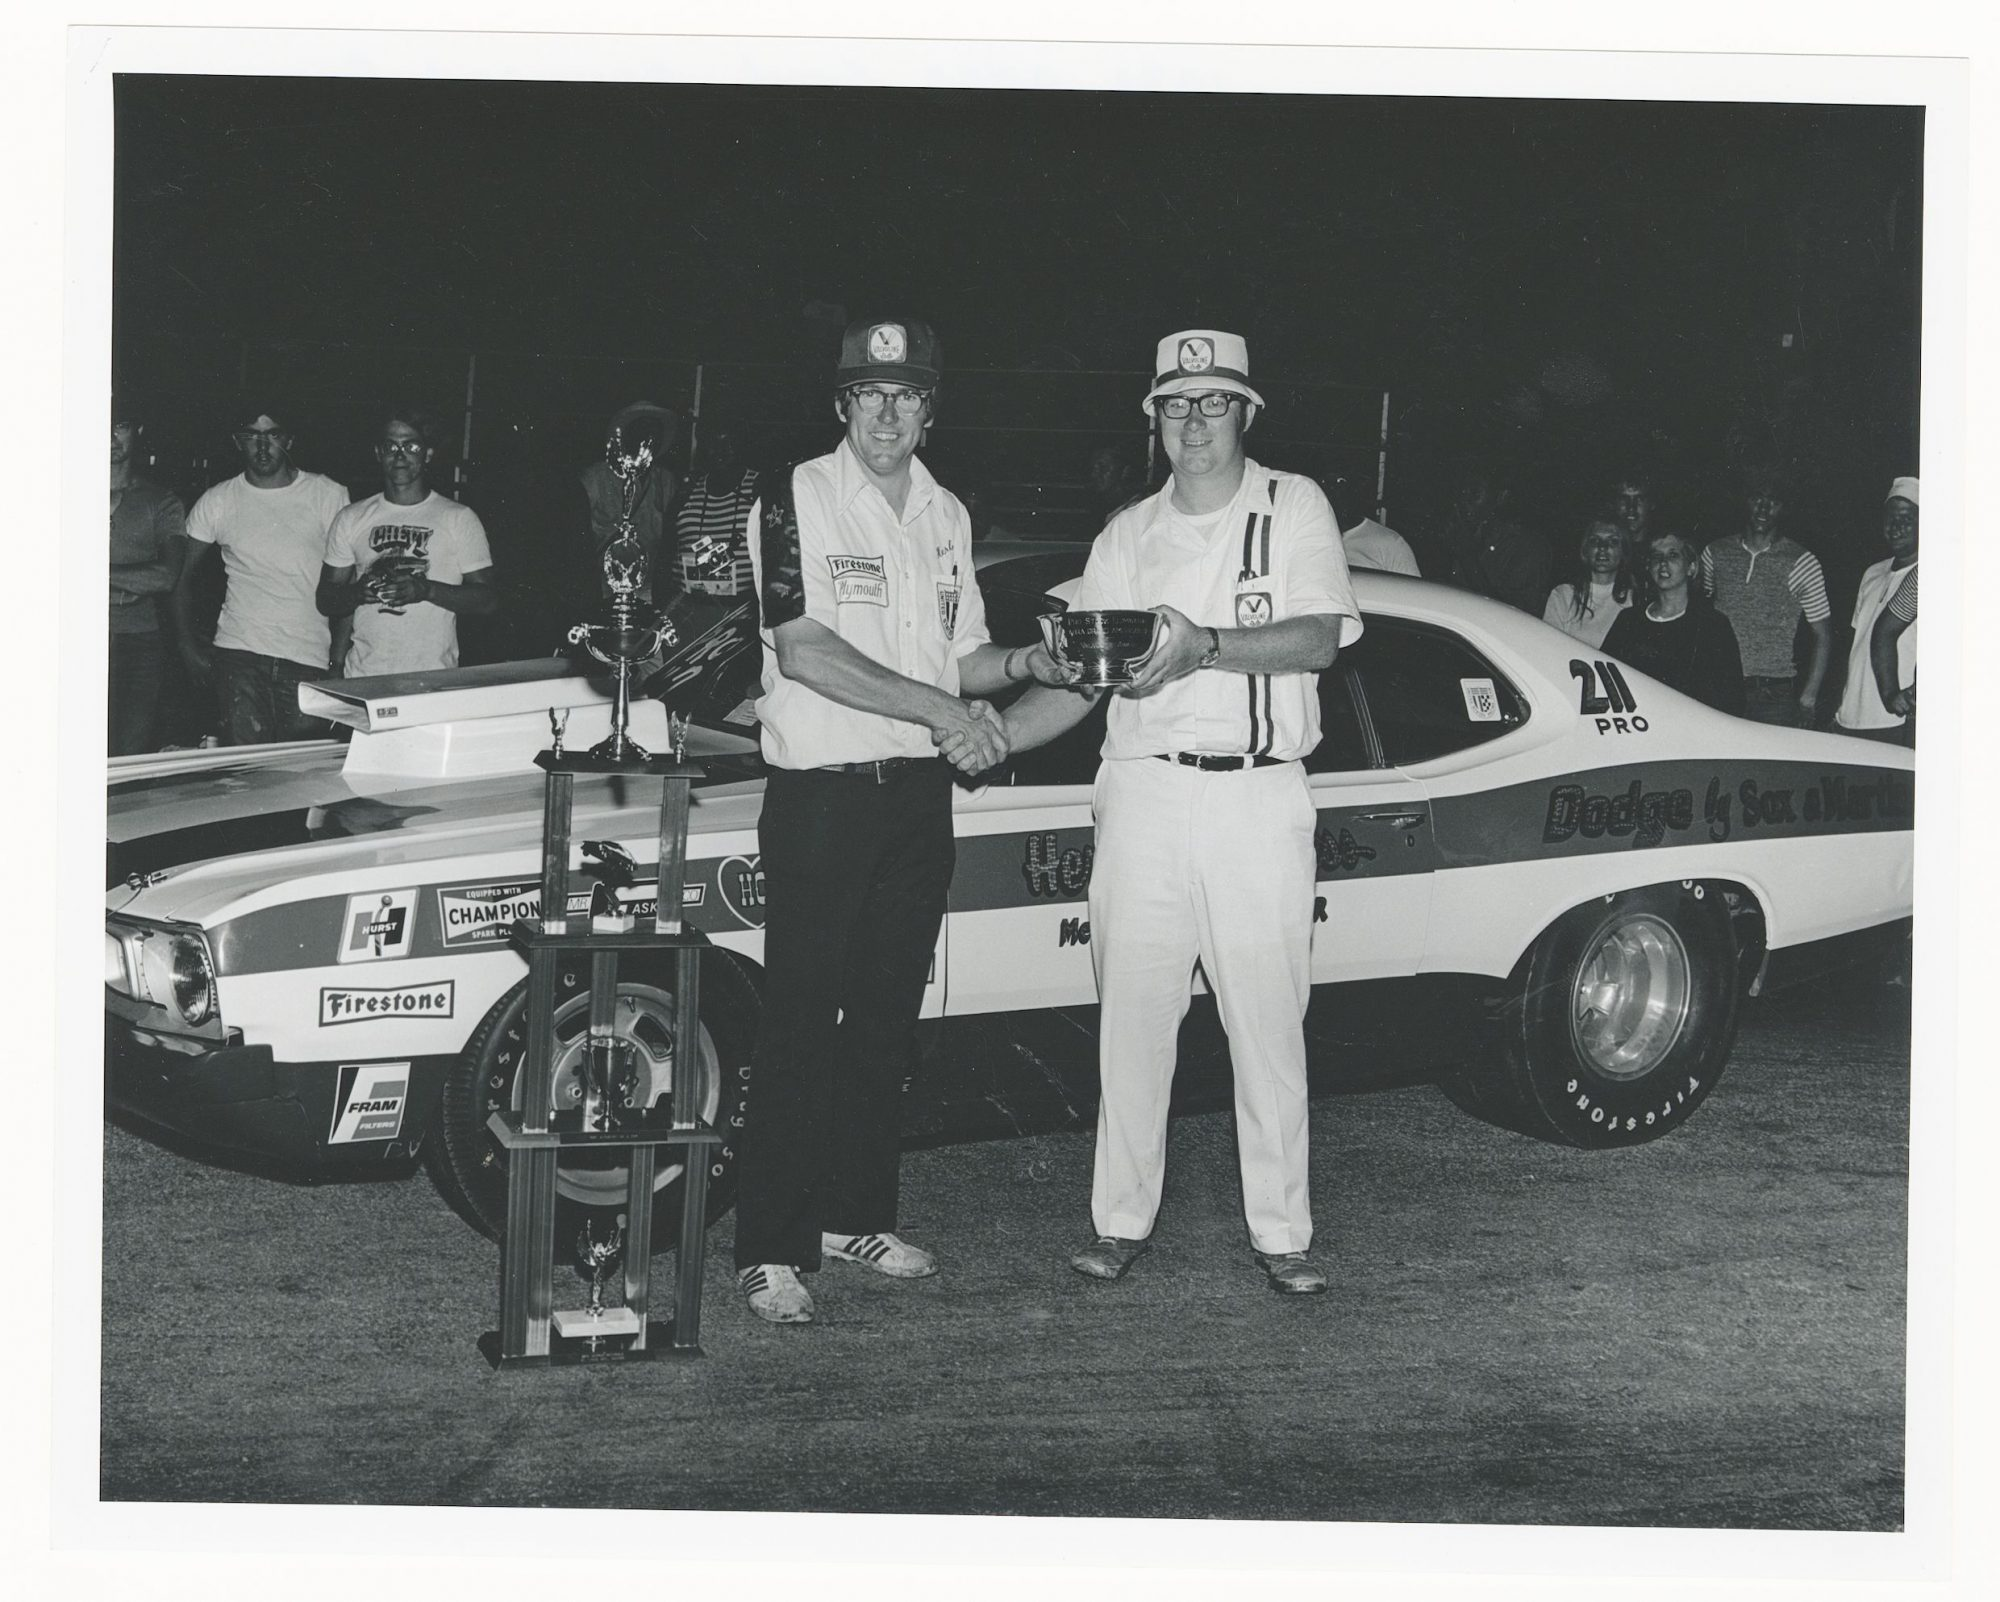 Herb McCandless receiving a trophy